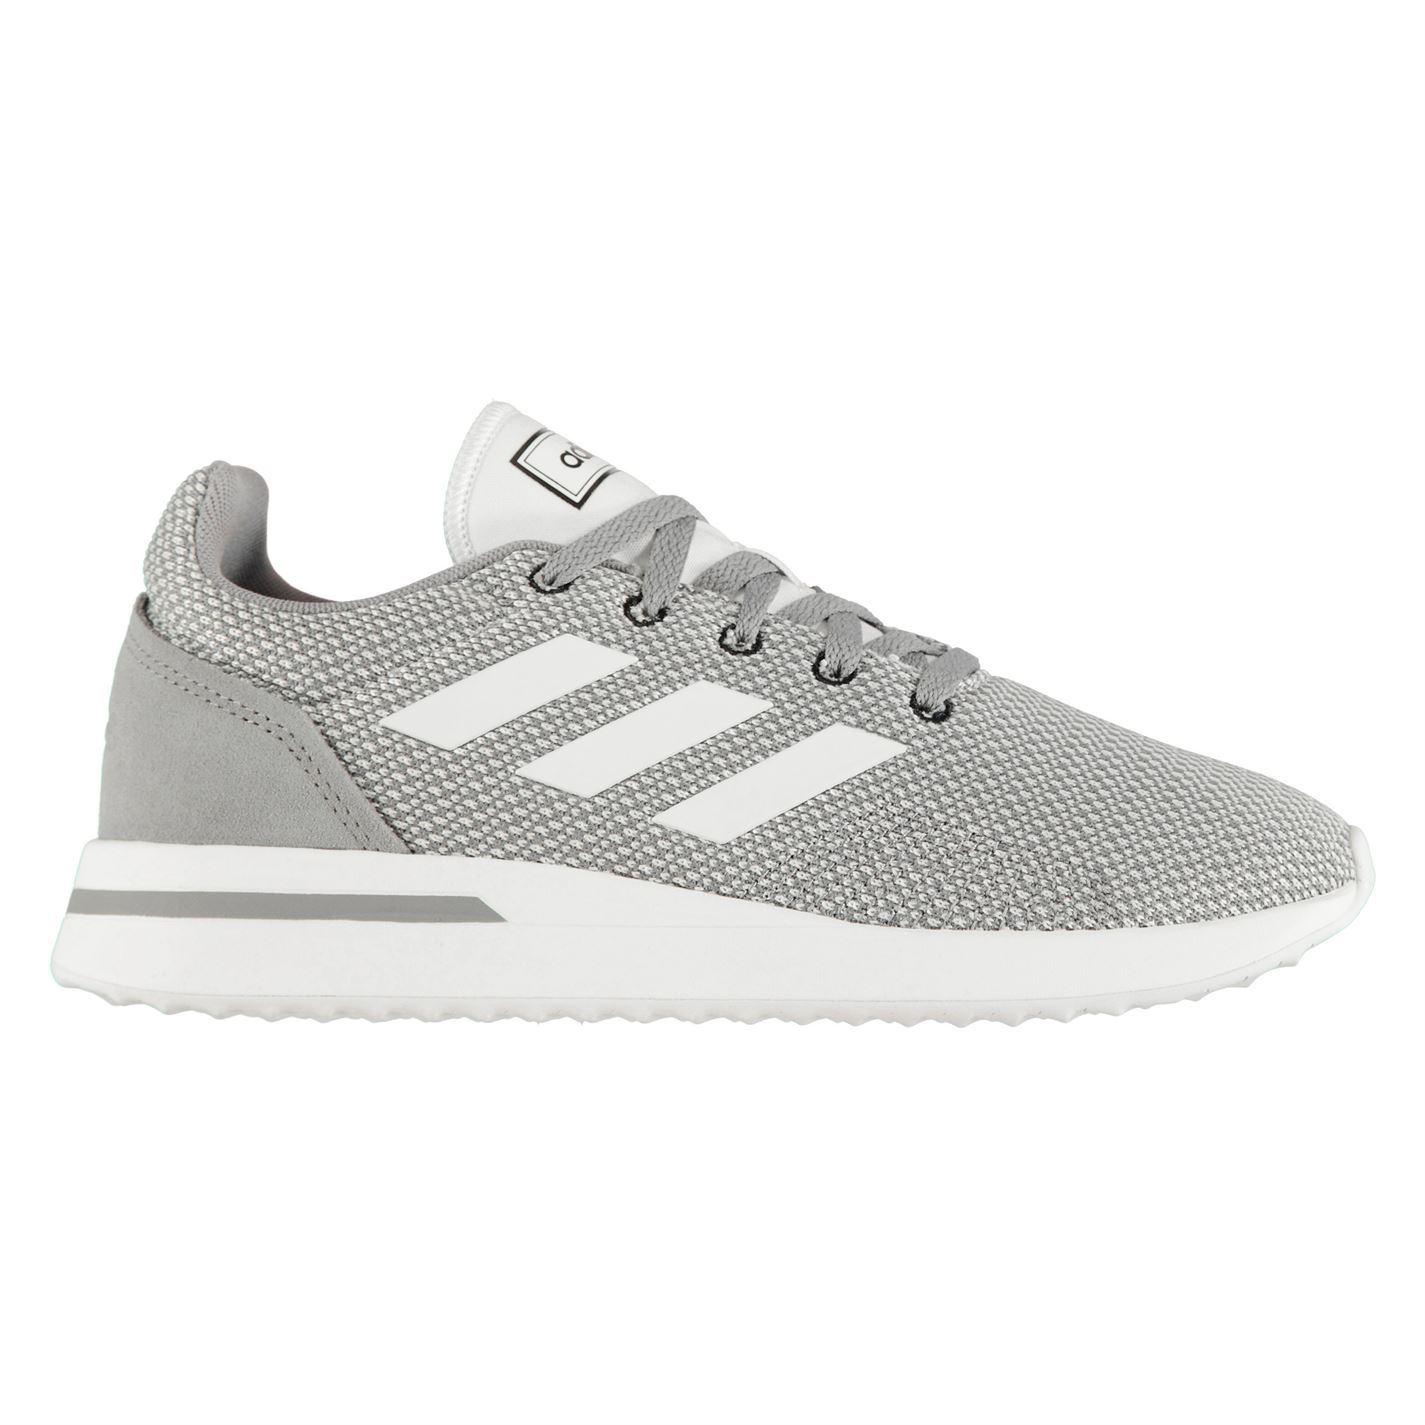 buy online 0aeca c9f66 scarpe da ginnastica adidas scarpe